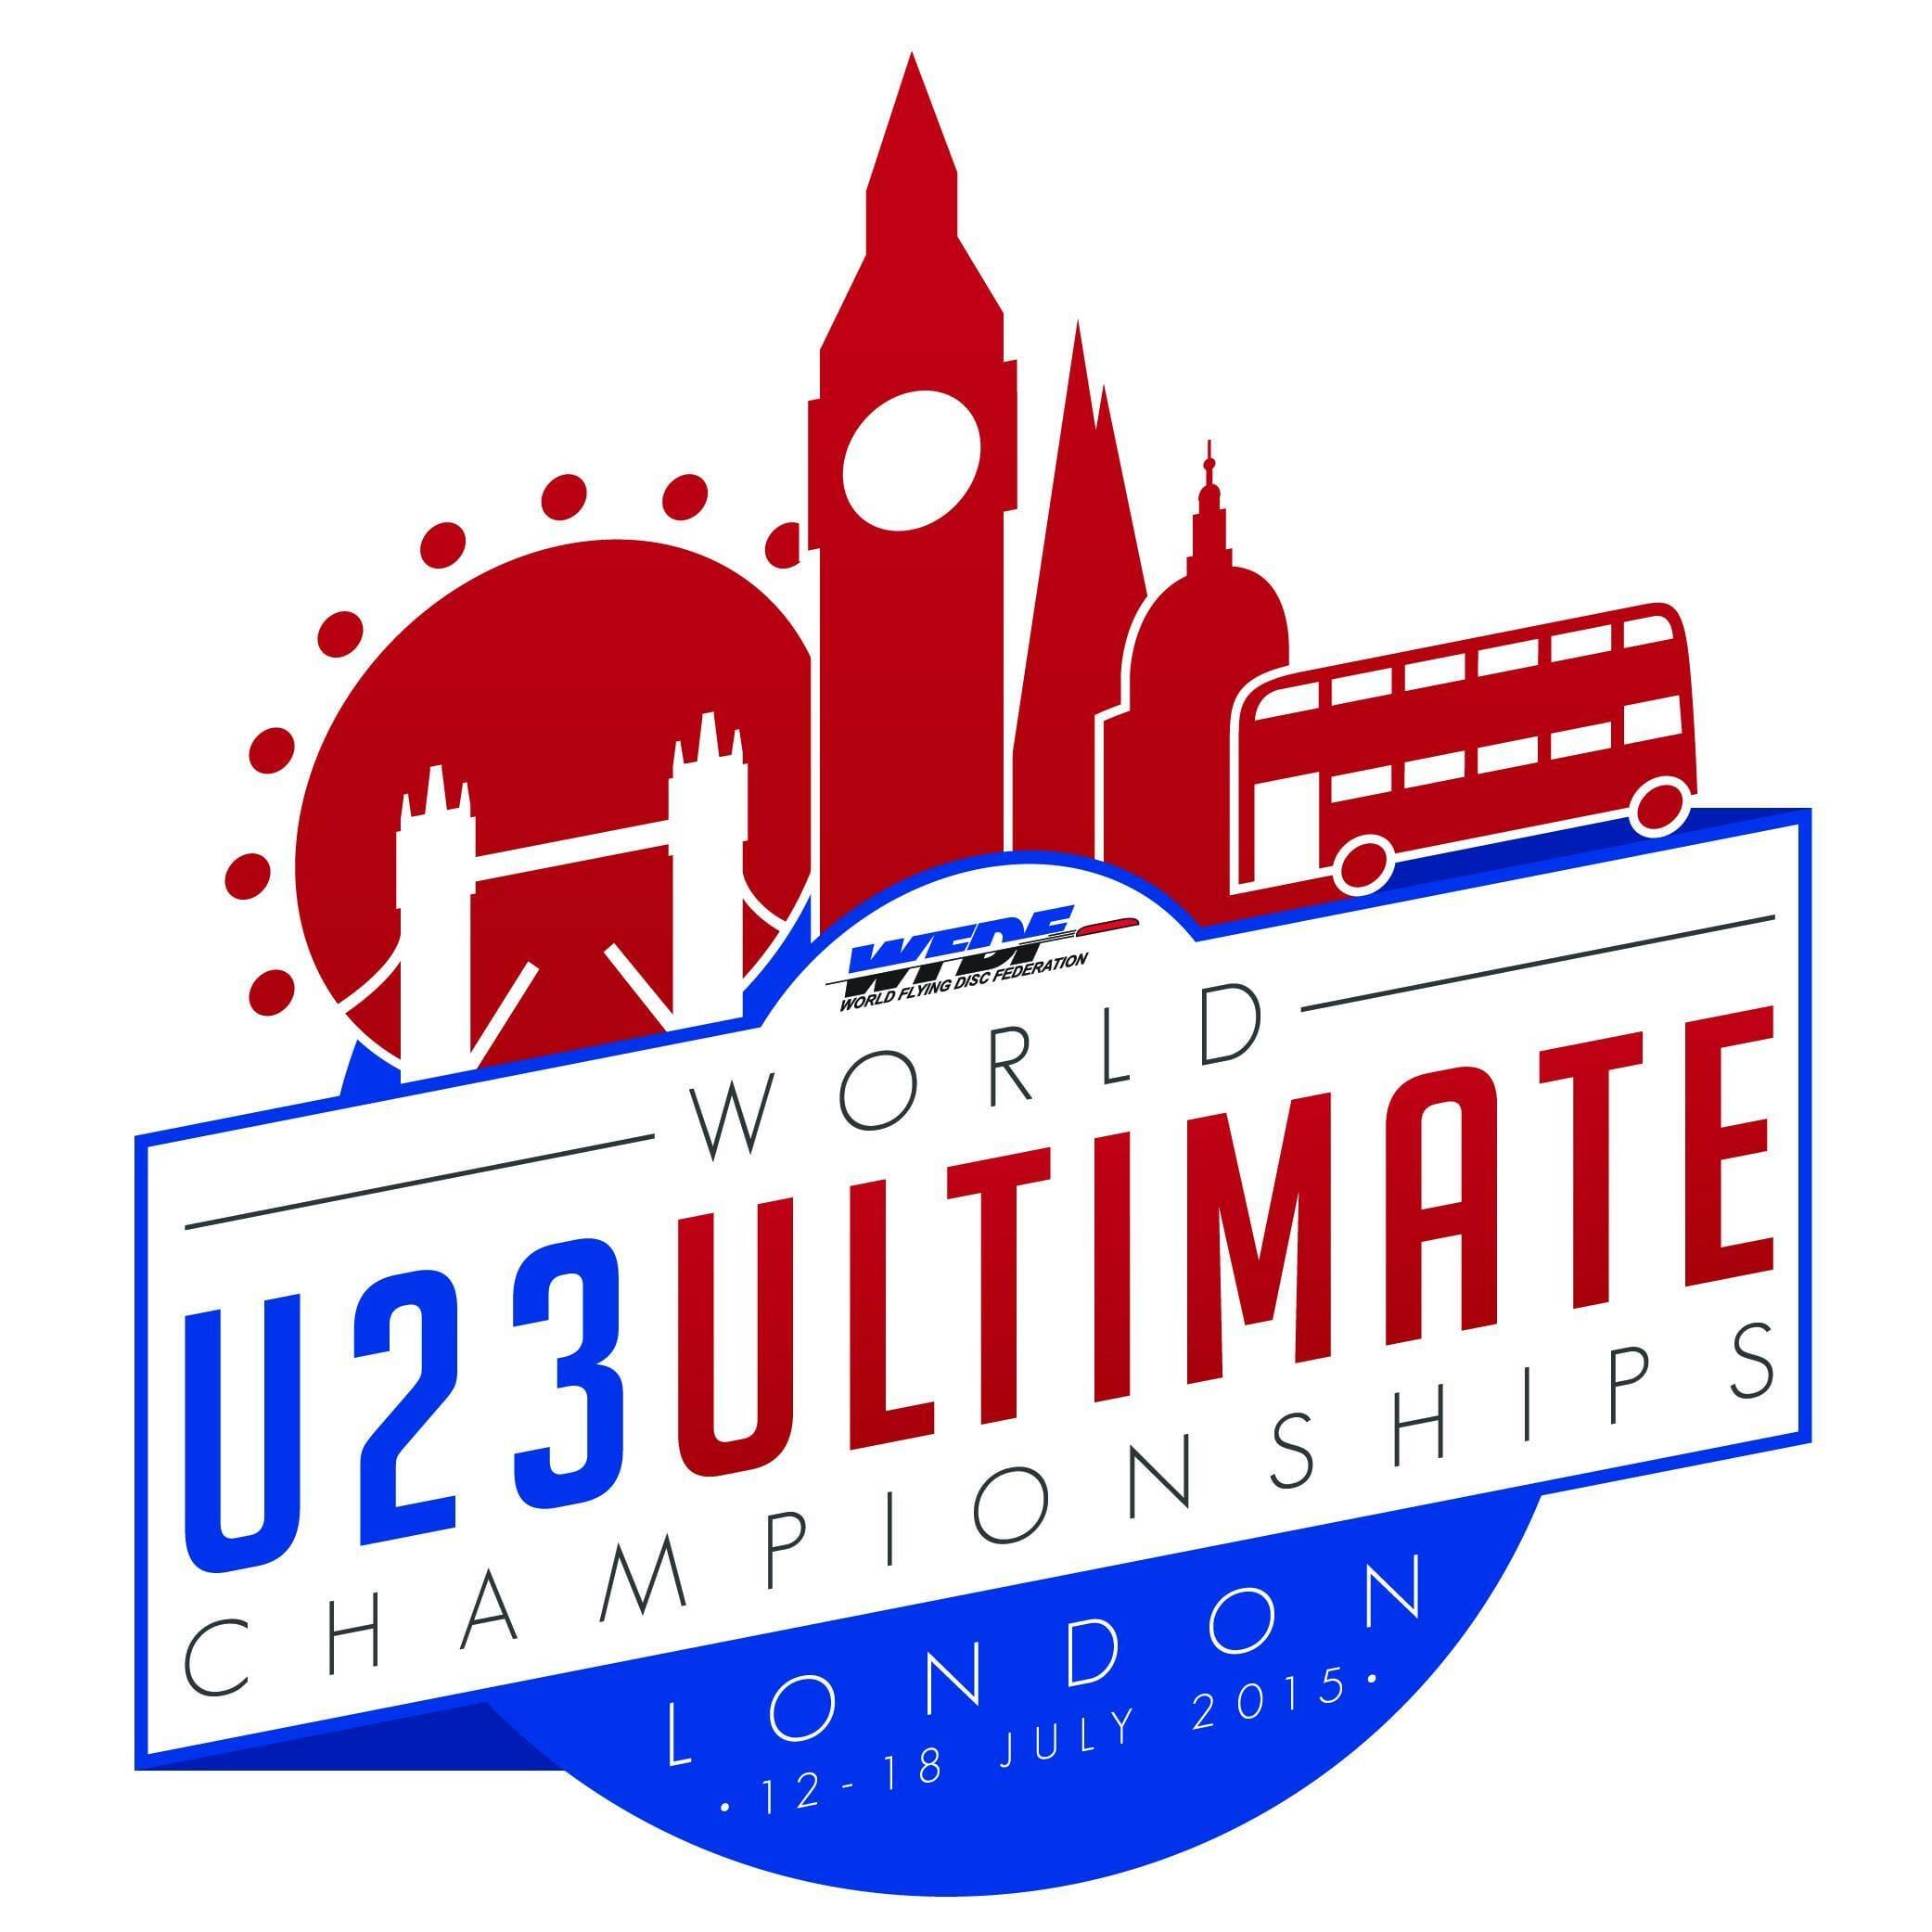 u23 worlds 2015 international team previews presented by